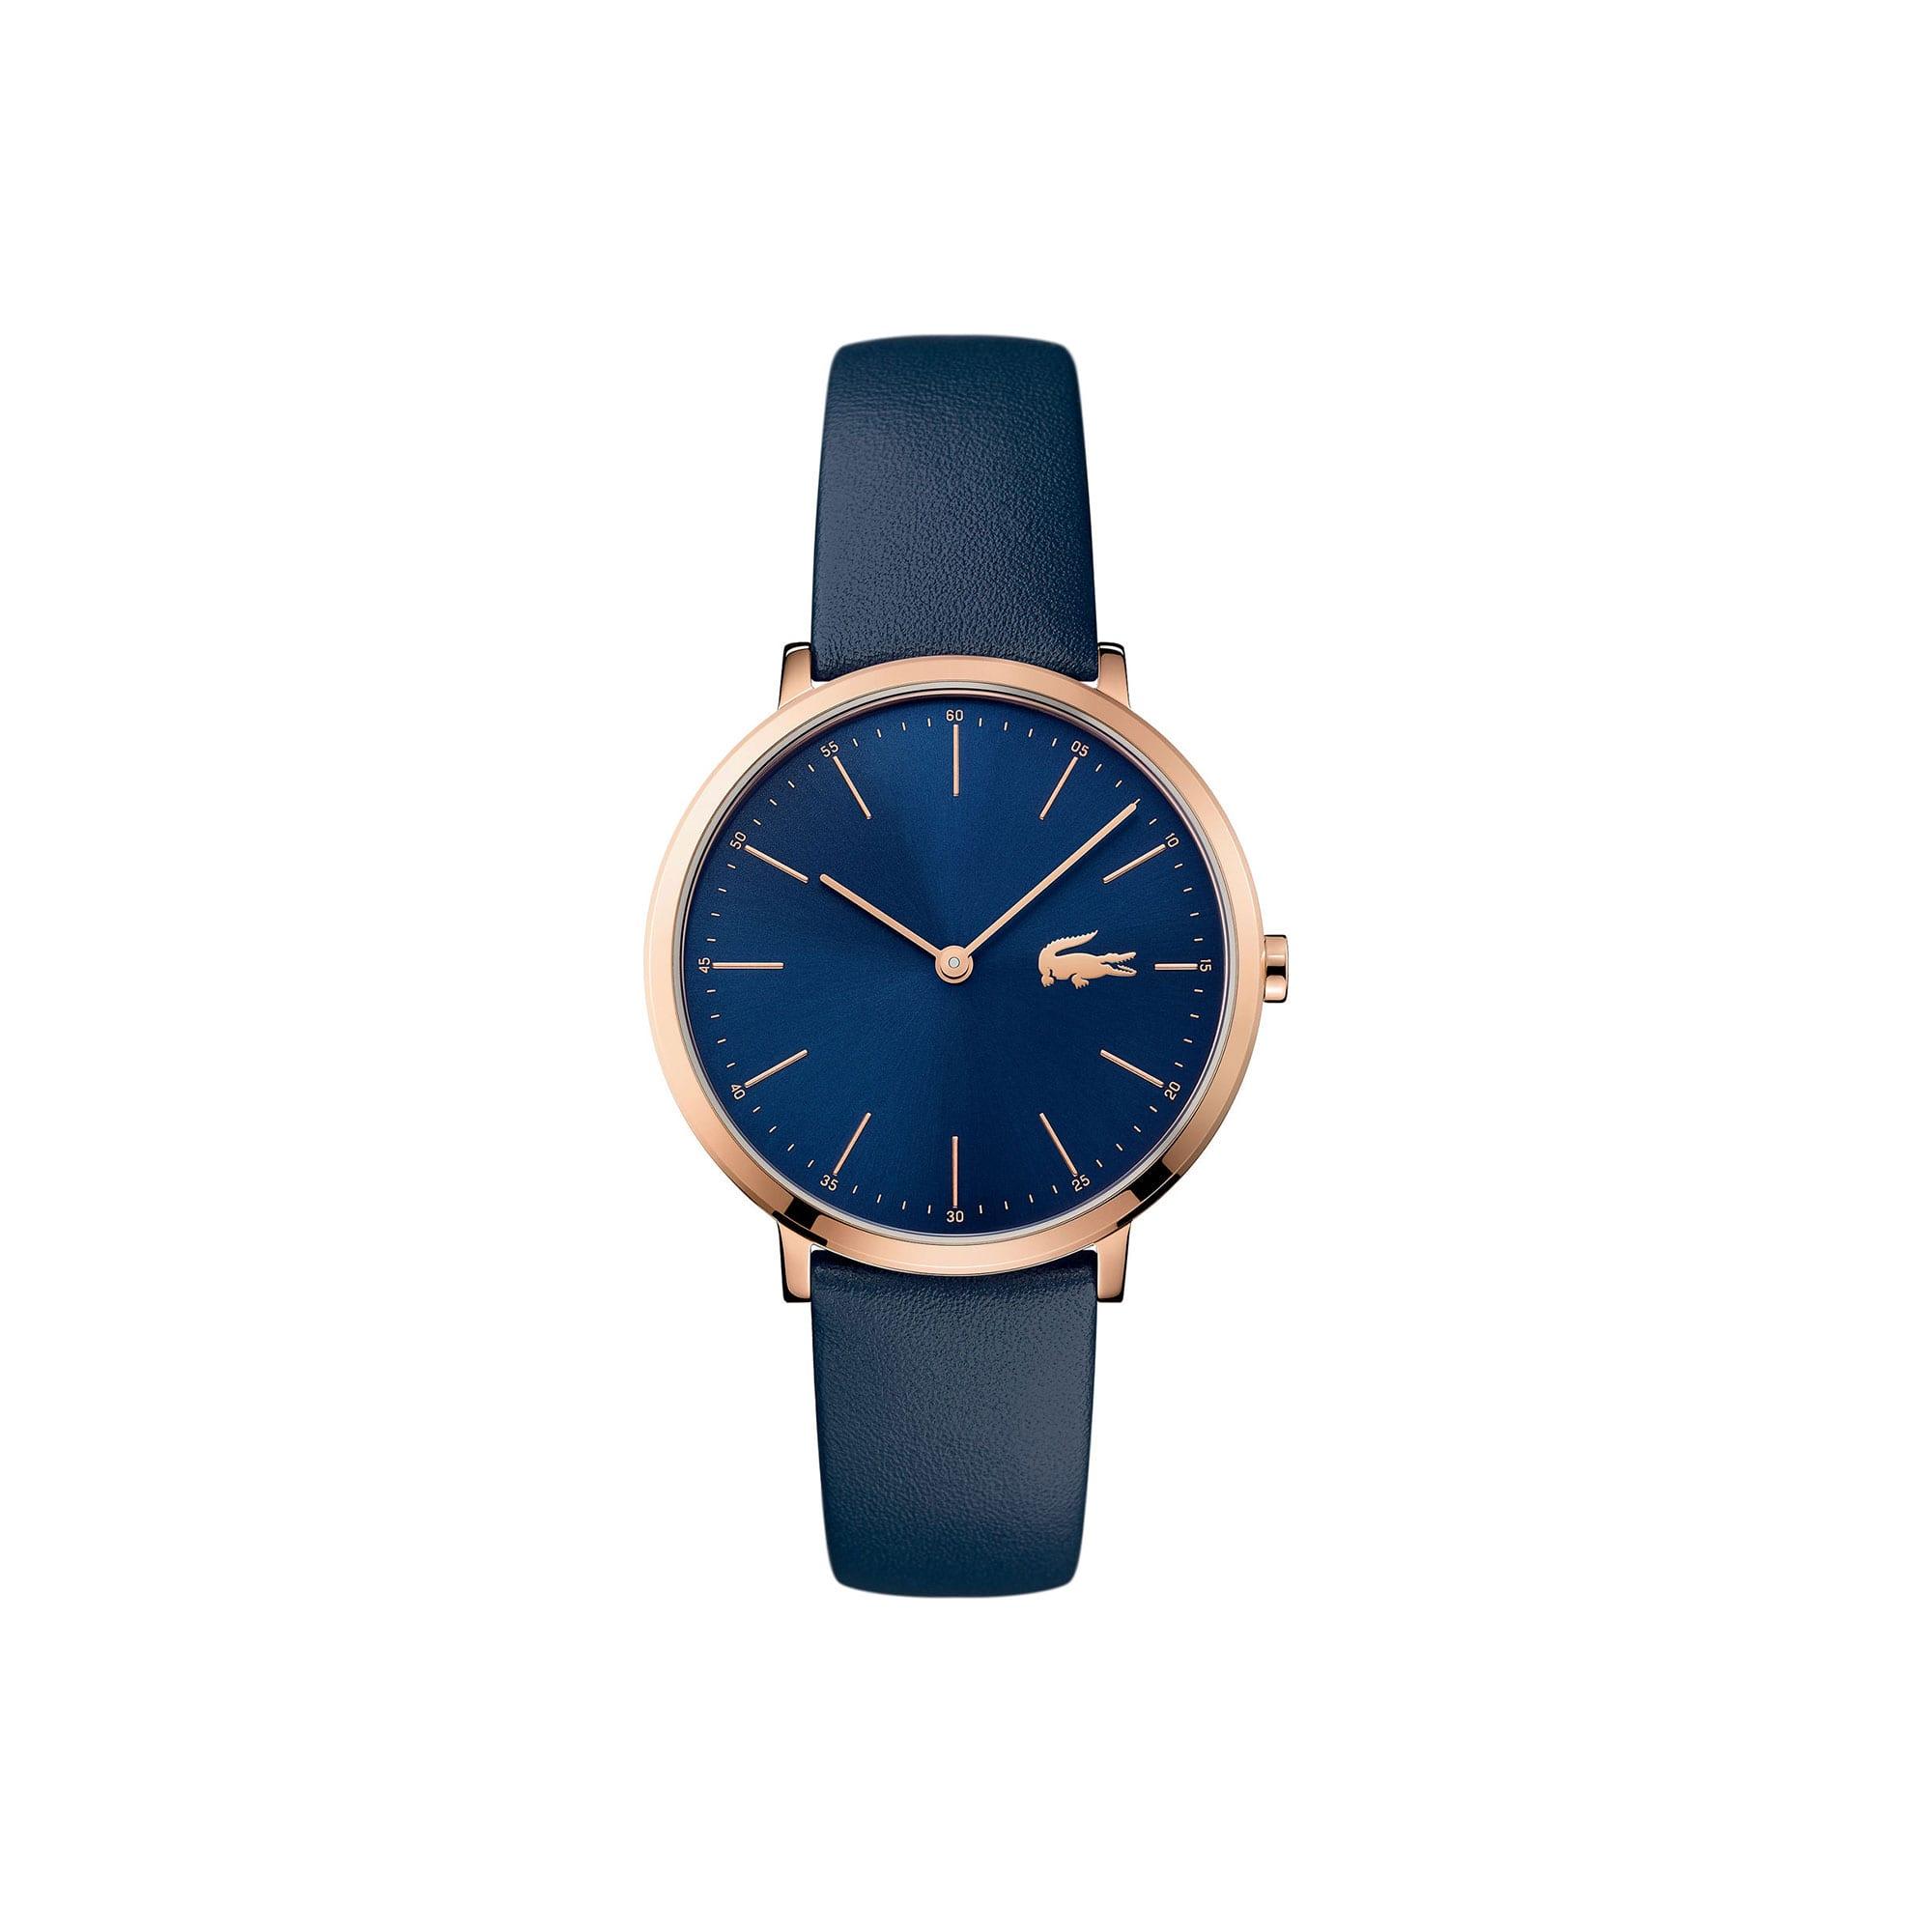 Relógio ultra slim Moon de mulher com bracelete de pele azul